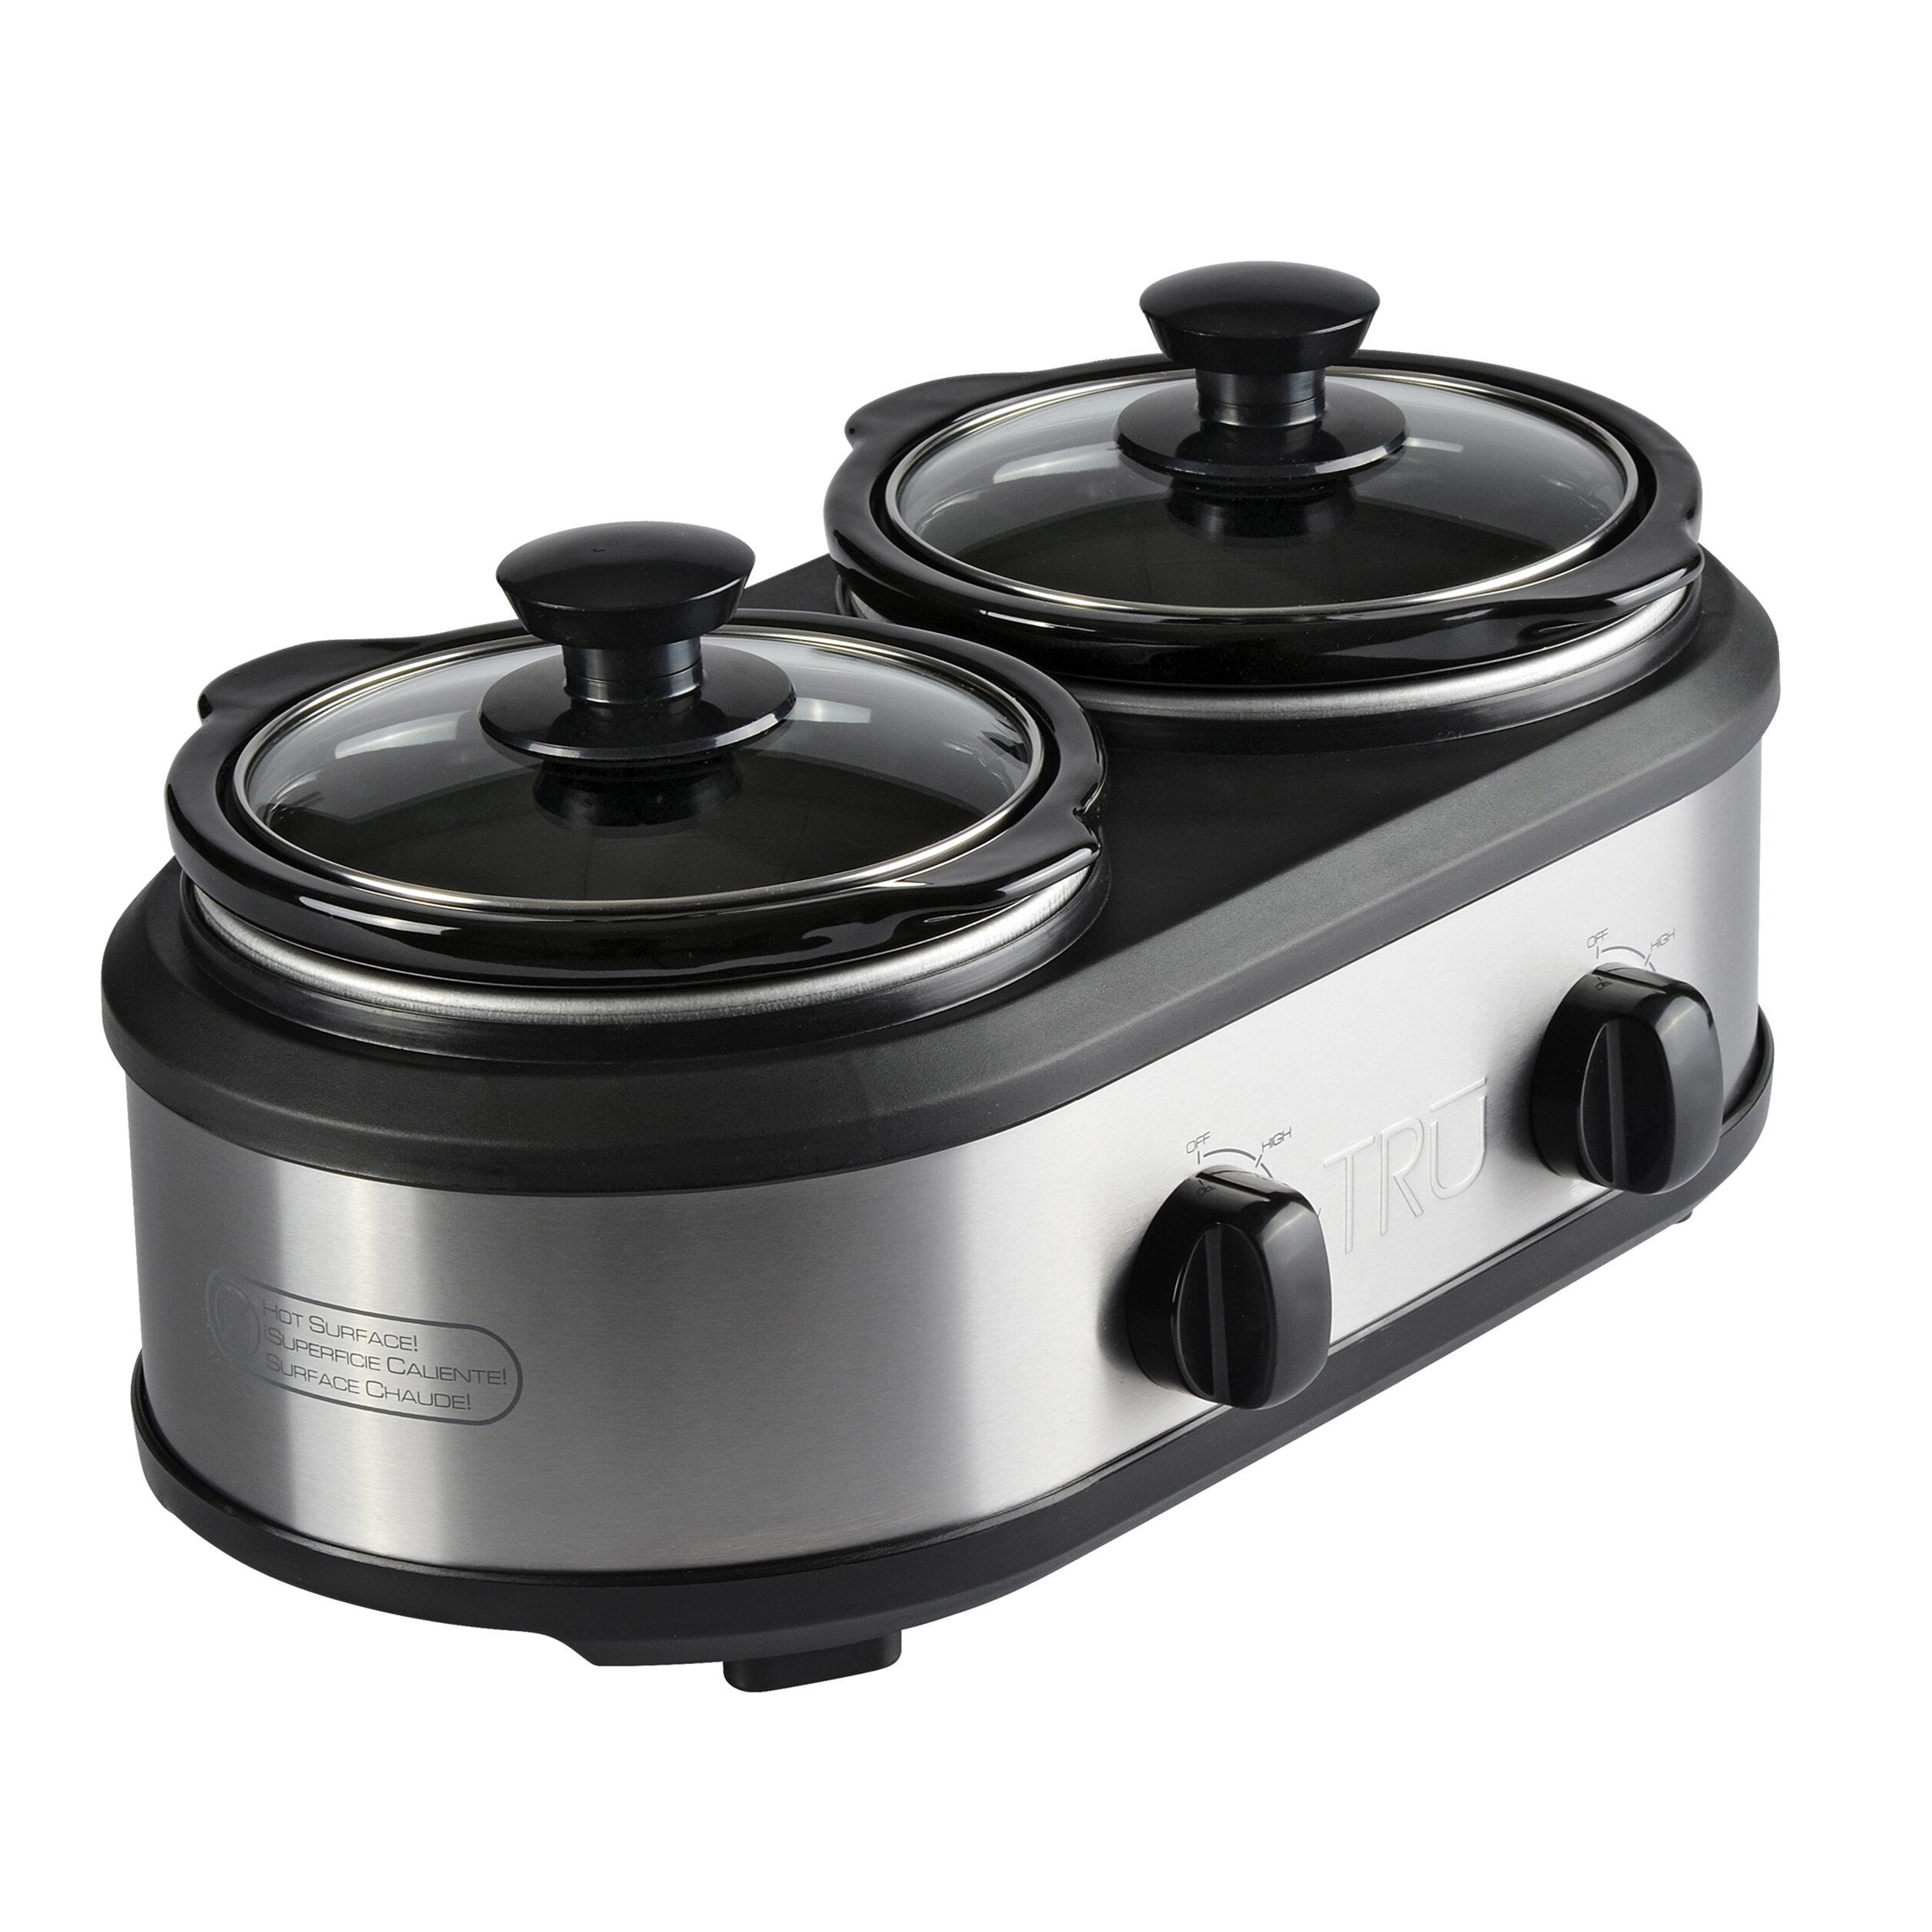 TRU Triple Slow Cooker Crock Pot Buffet Server Set 3 x 2.5 Quart Oval Inserts